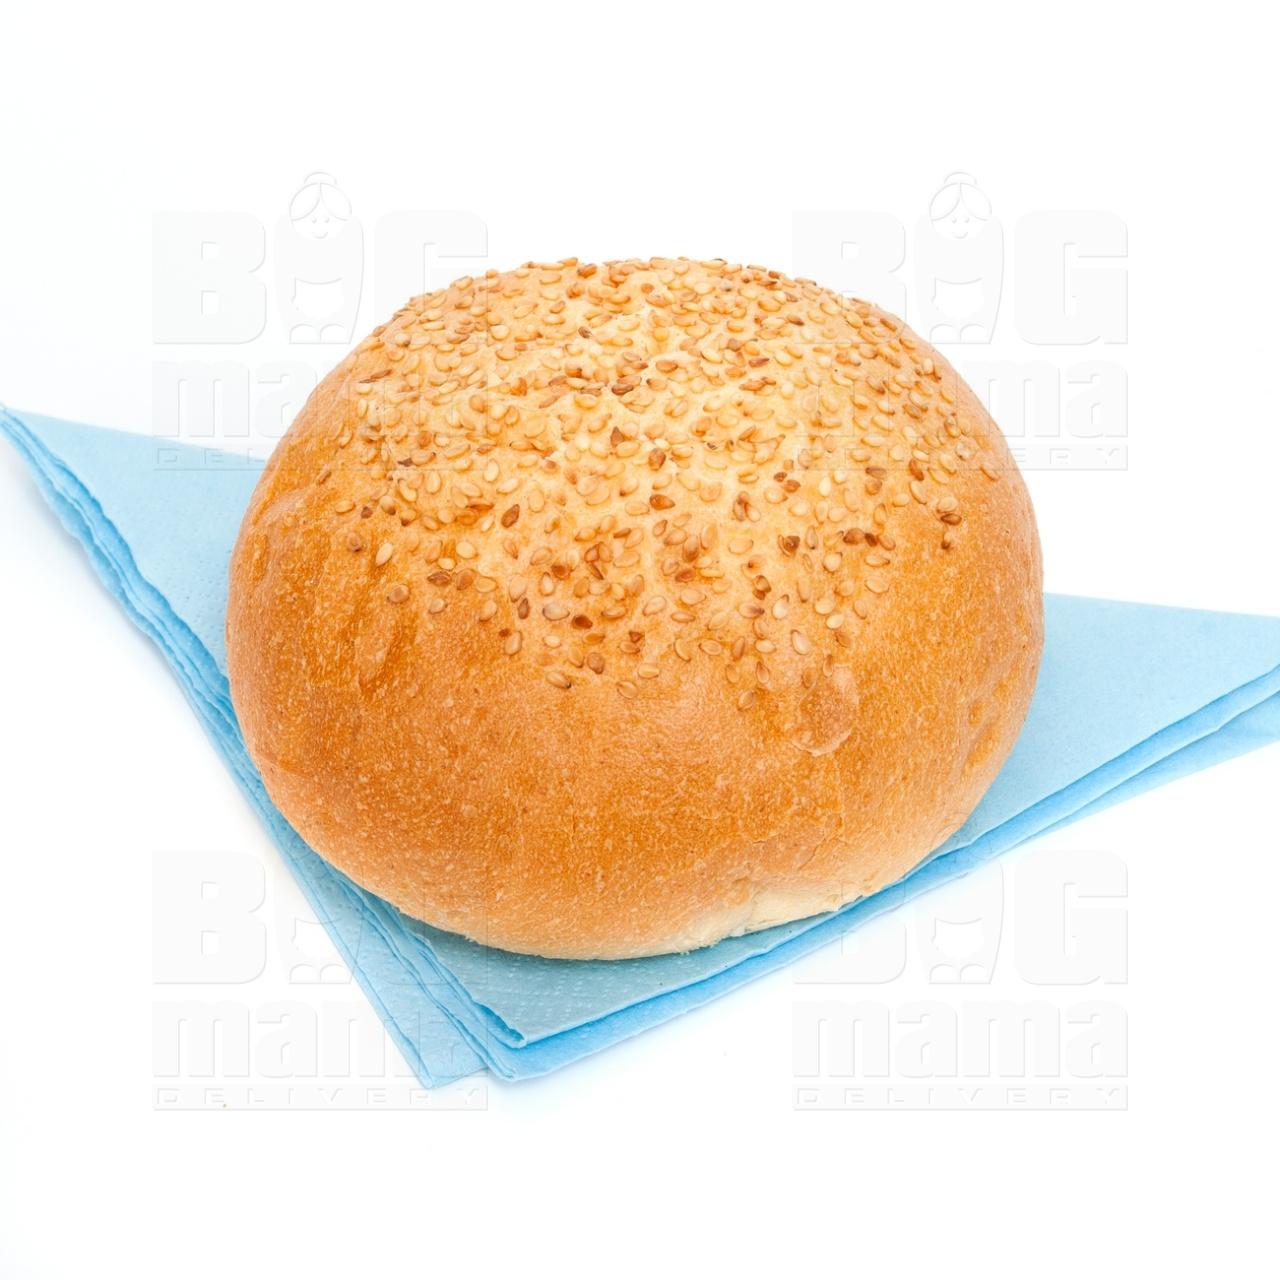 Product #68 image - Little bun